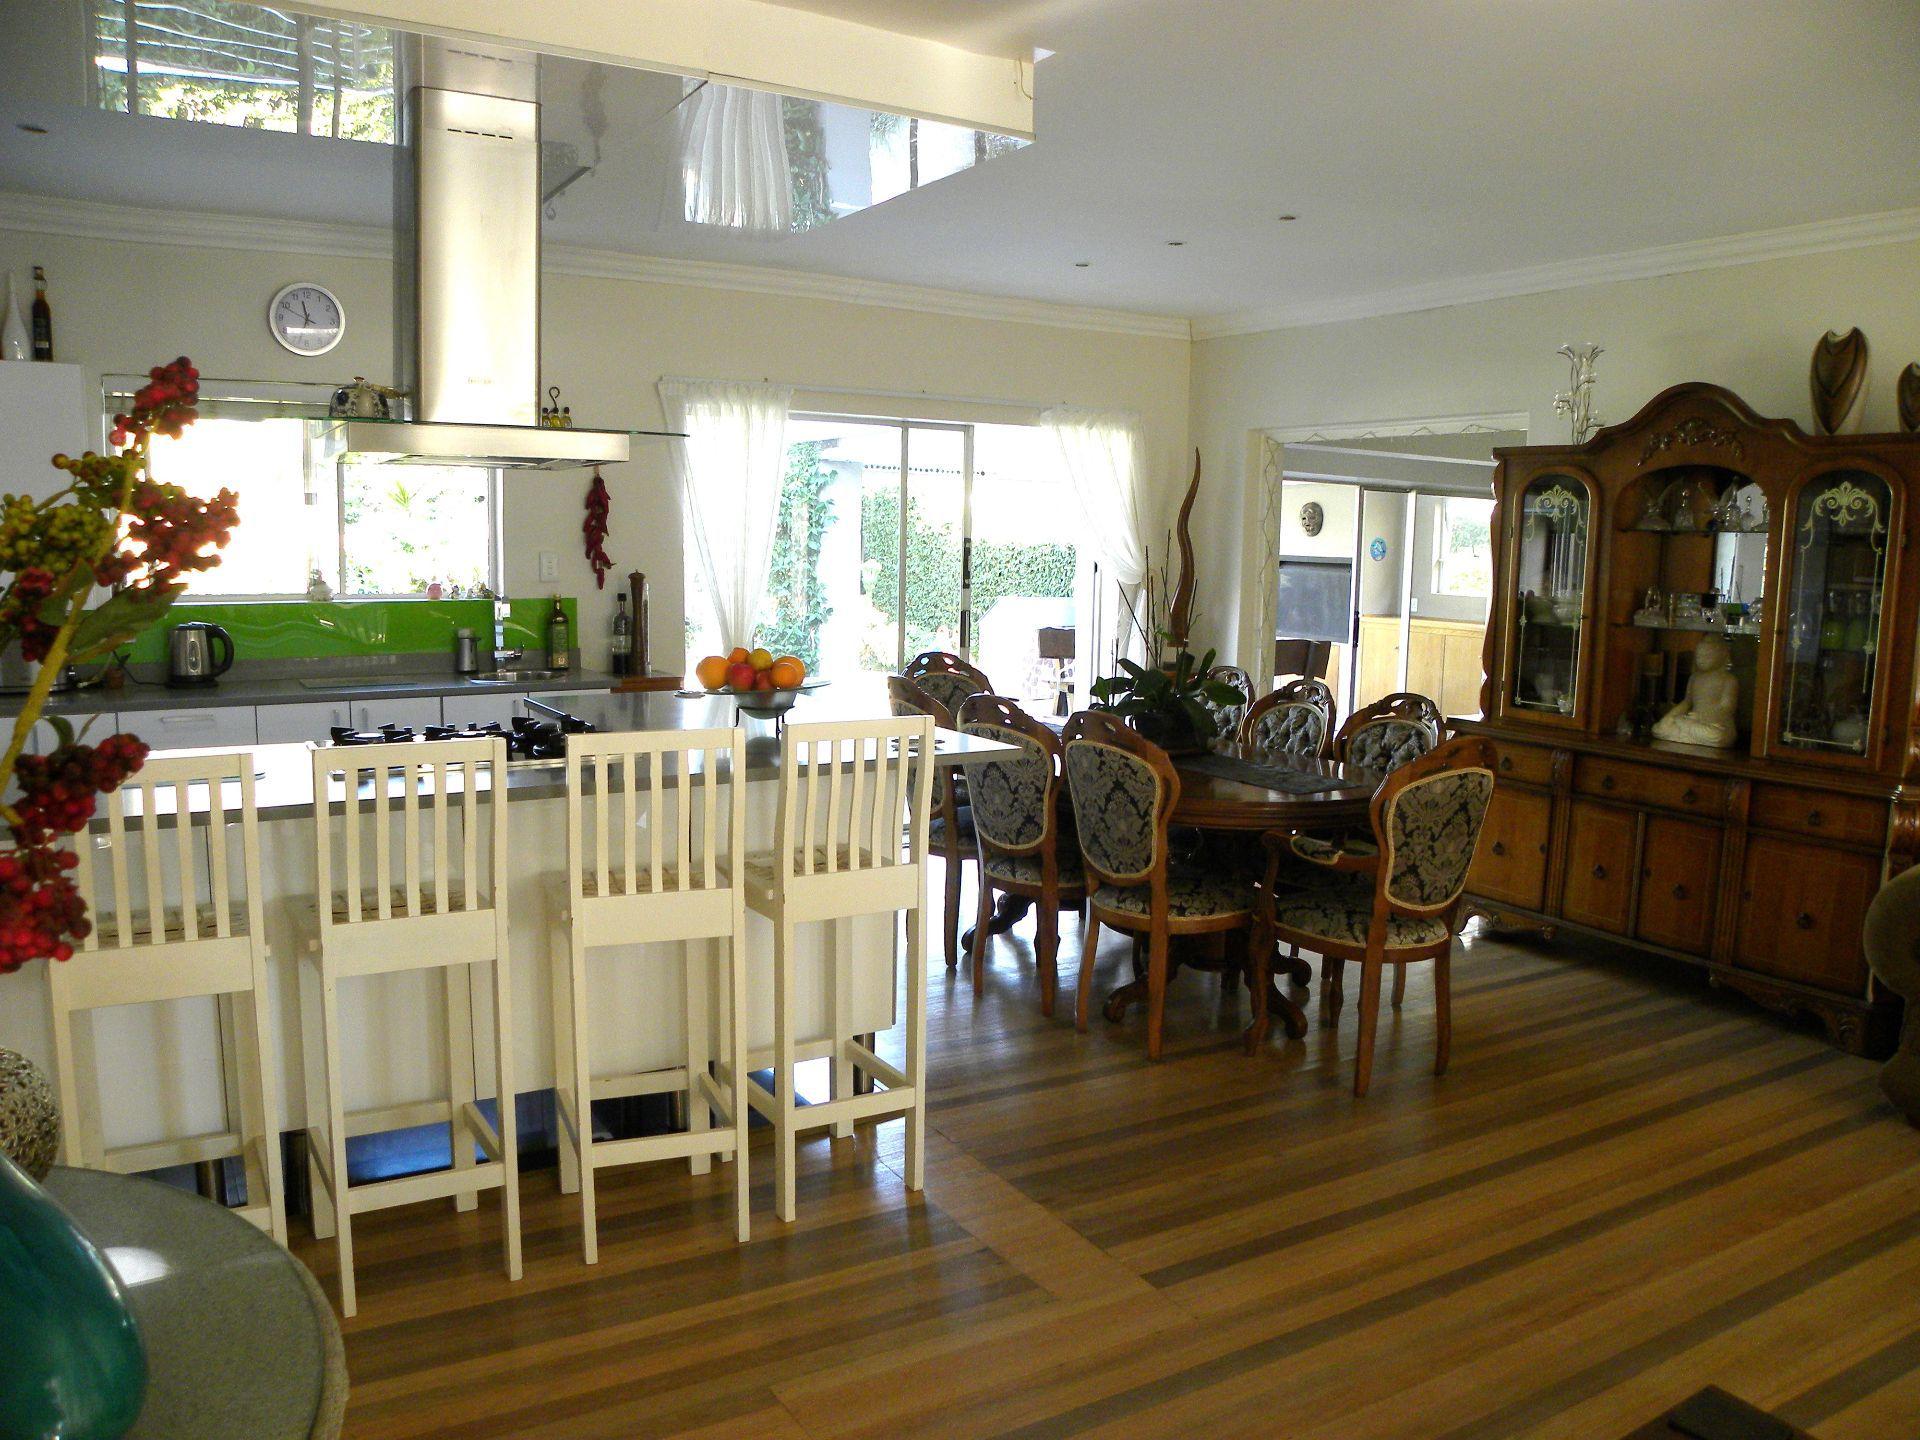 Bonnie Doone property for sale. Ref No: 13501808. Picture no 6